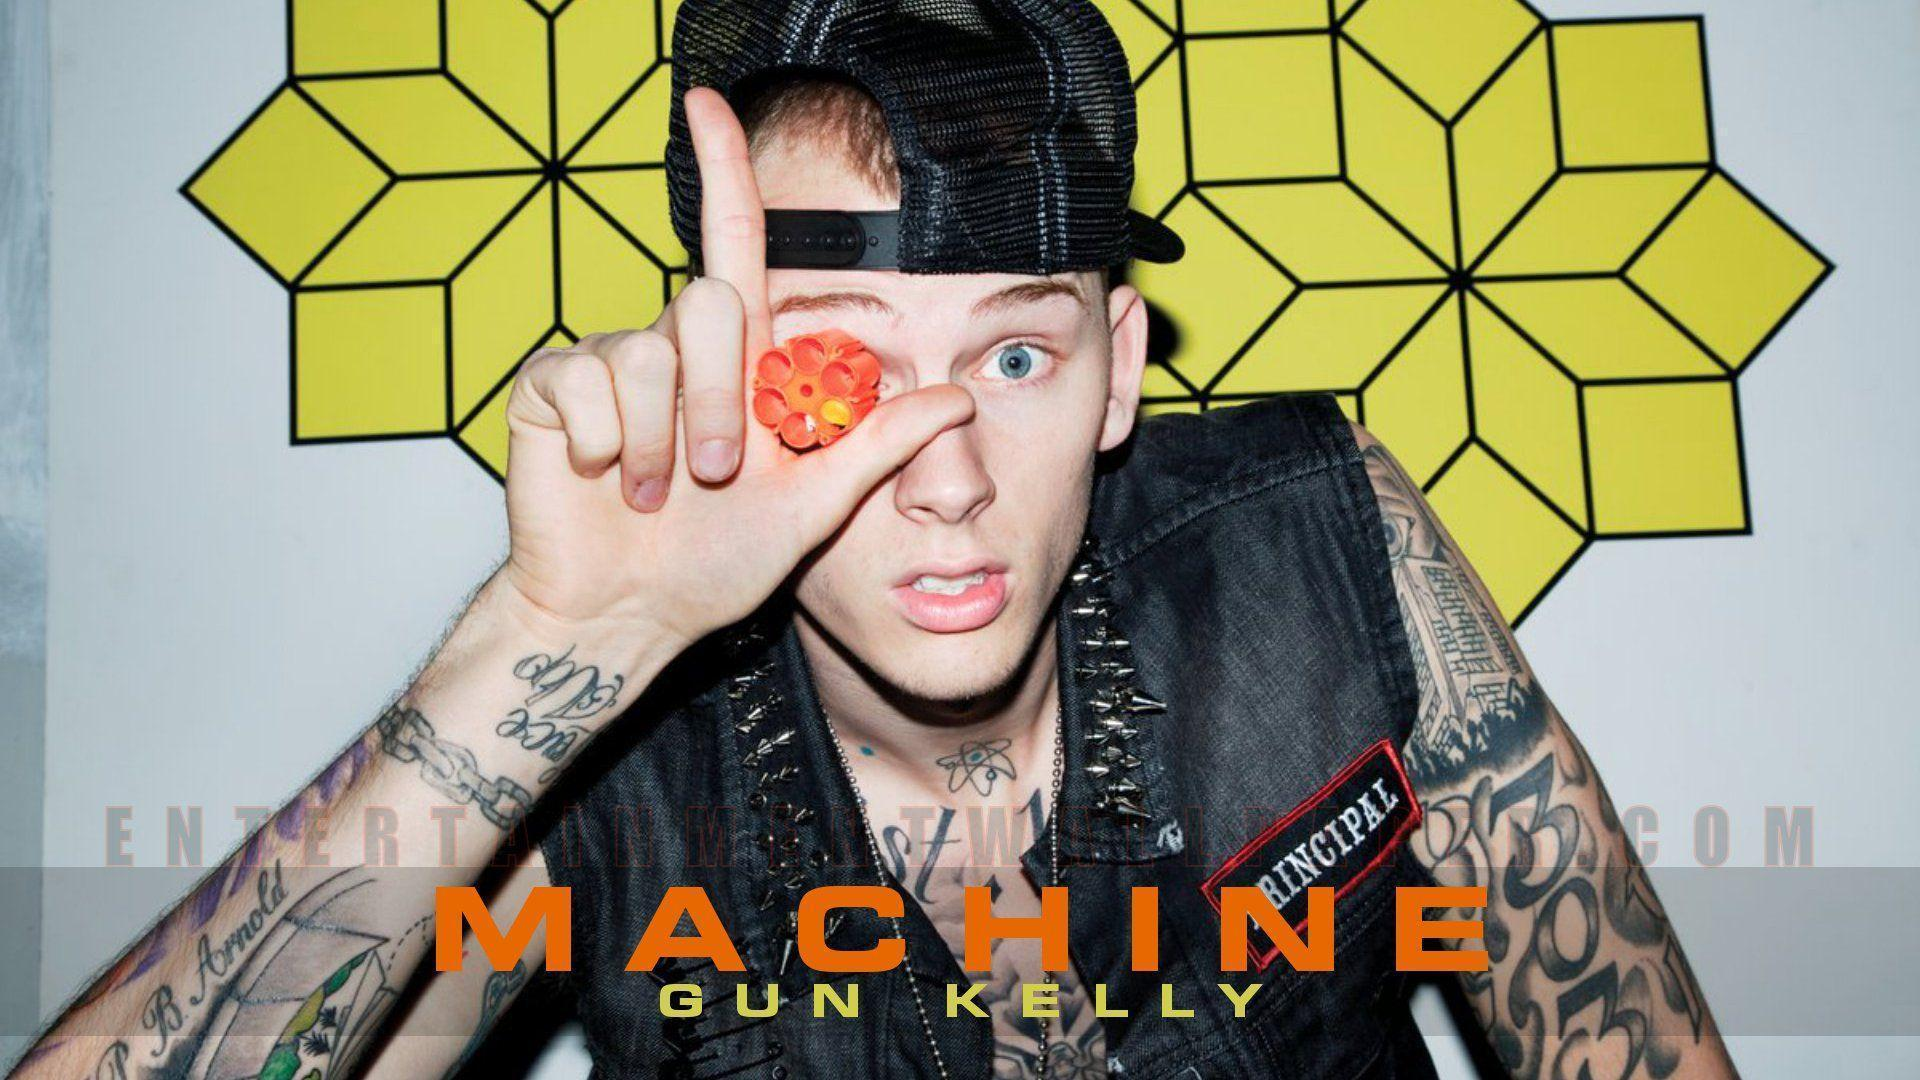 machine gun kelly wallpaper - photo #9